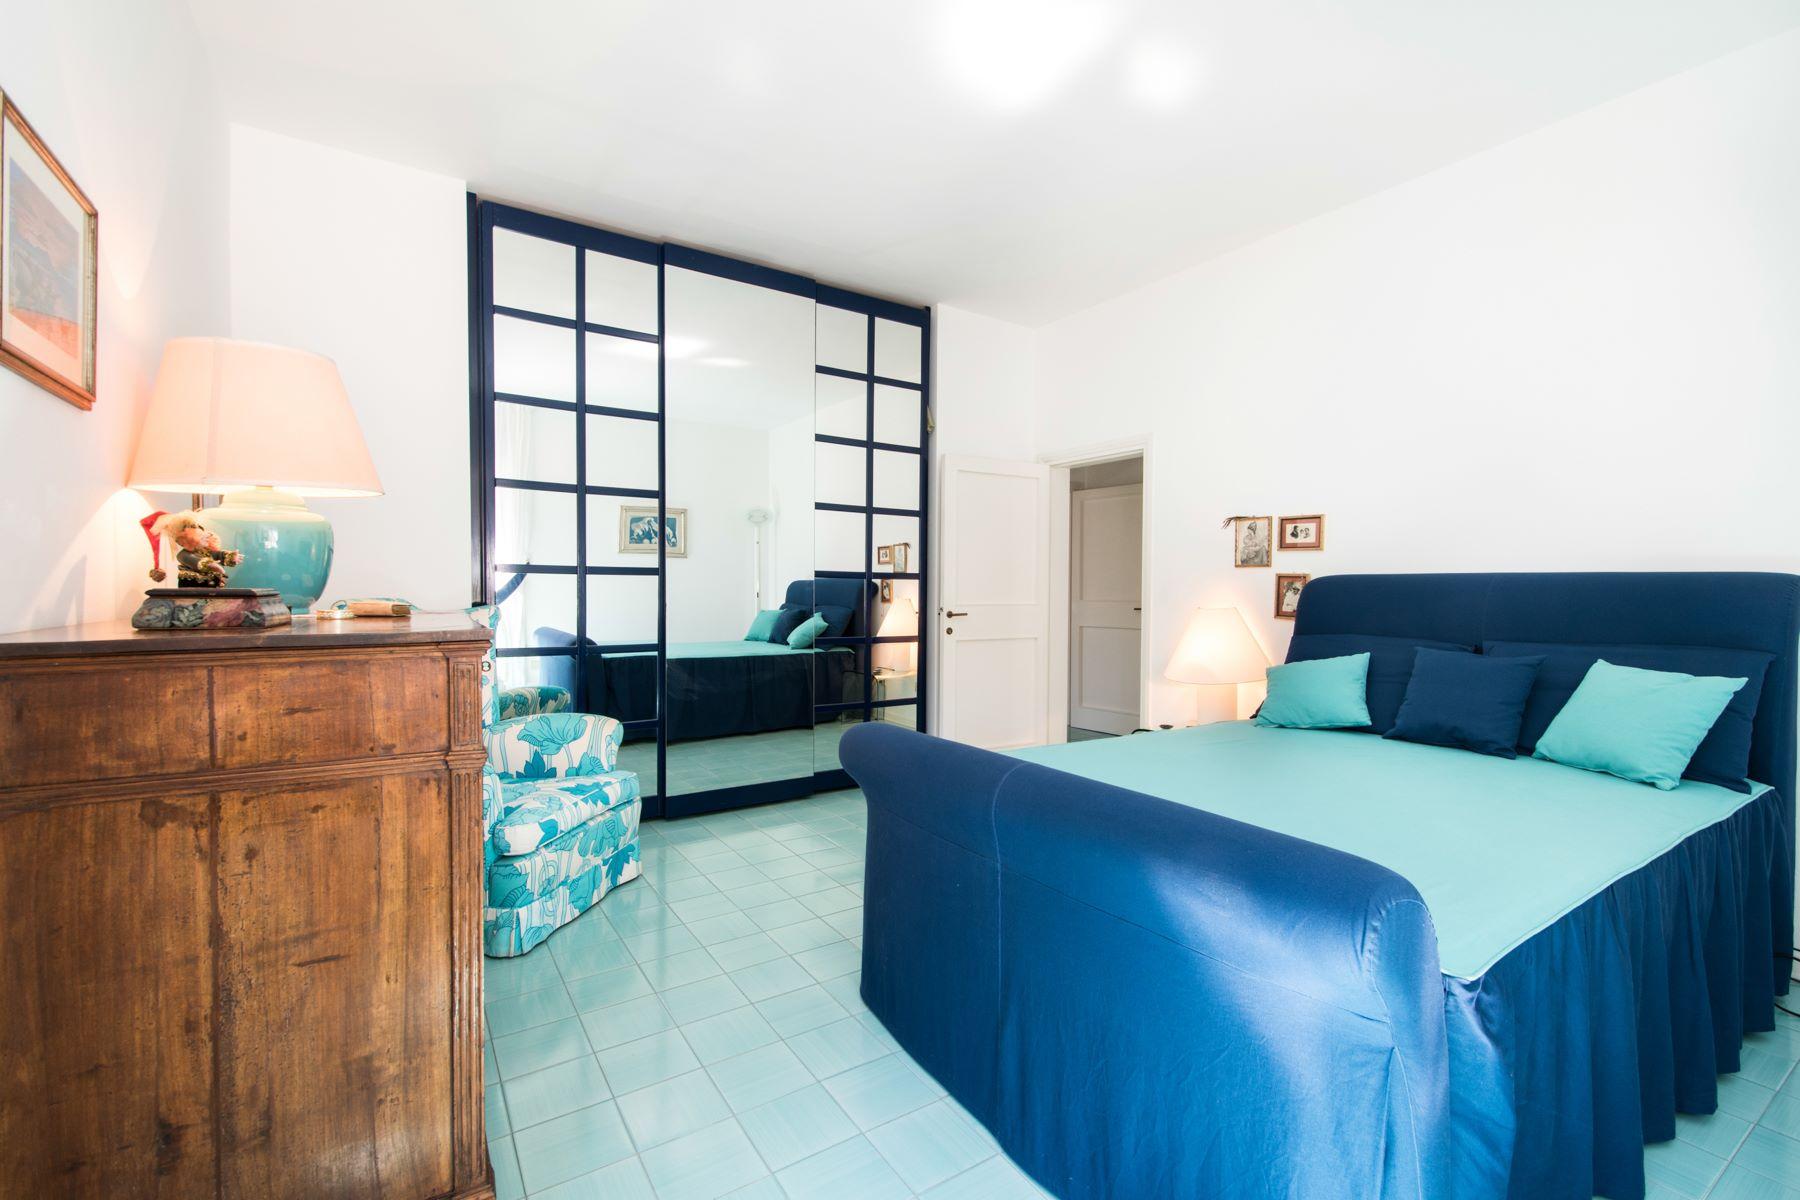 Additional photo for property listing at Unique beachfront villa with pool Via Einaudi Portoferraio, Livorno 57014 Italy